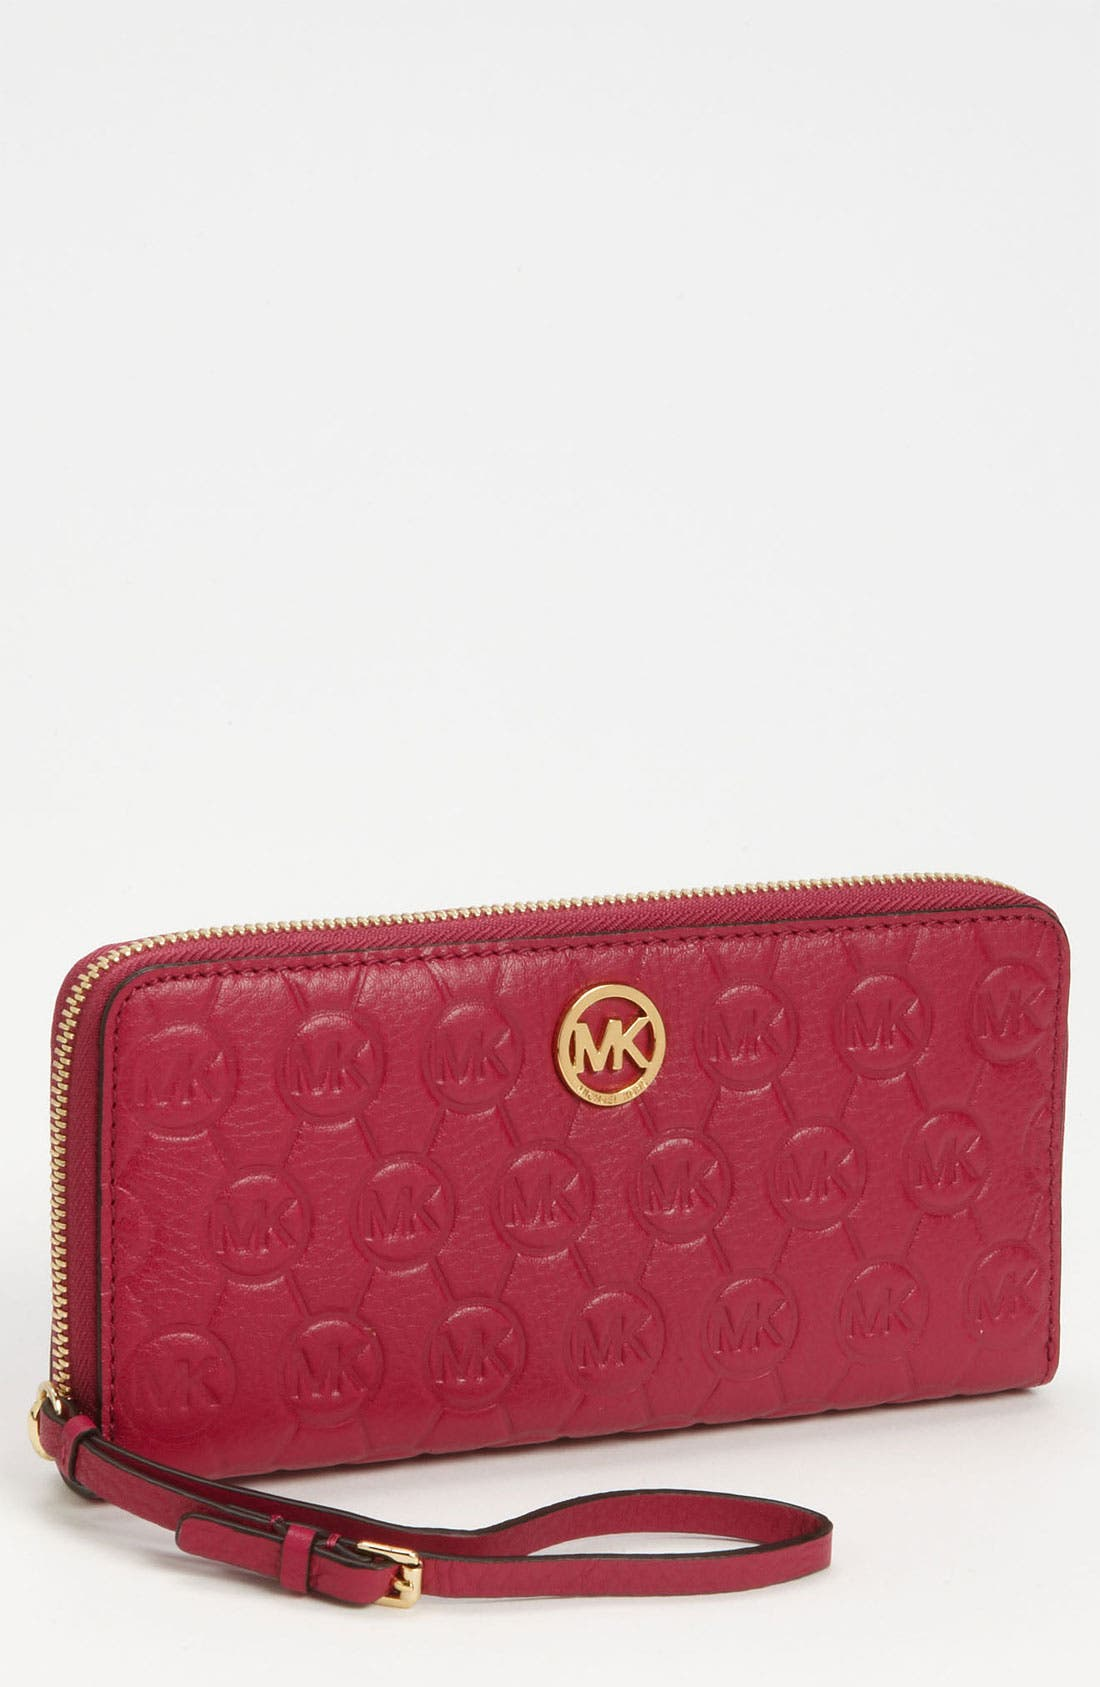 Alternate Image 1 Selected - MICHAEL Michael Kors Monogram Embossed Leather Wallet